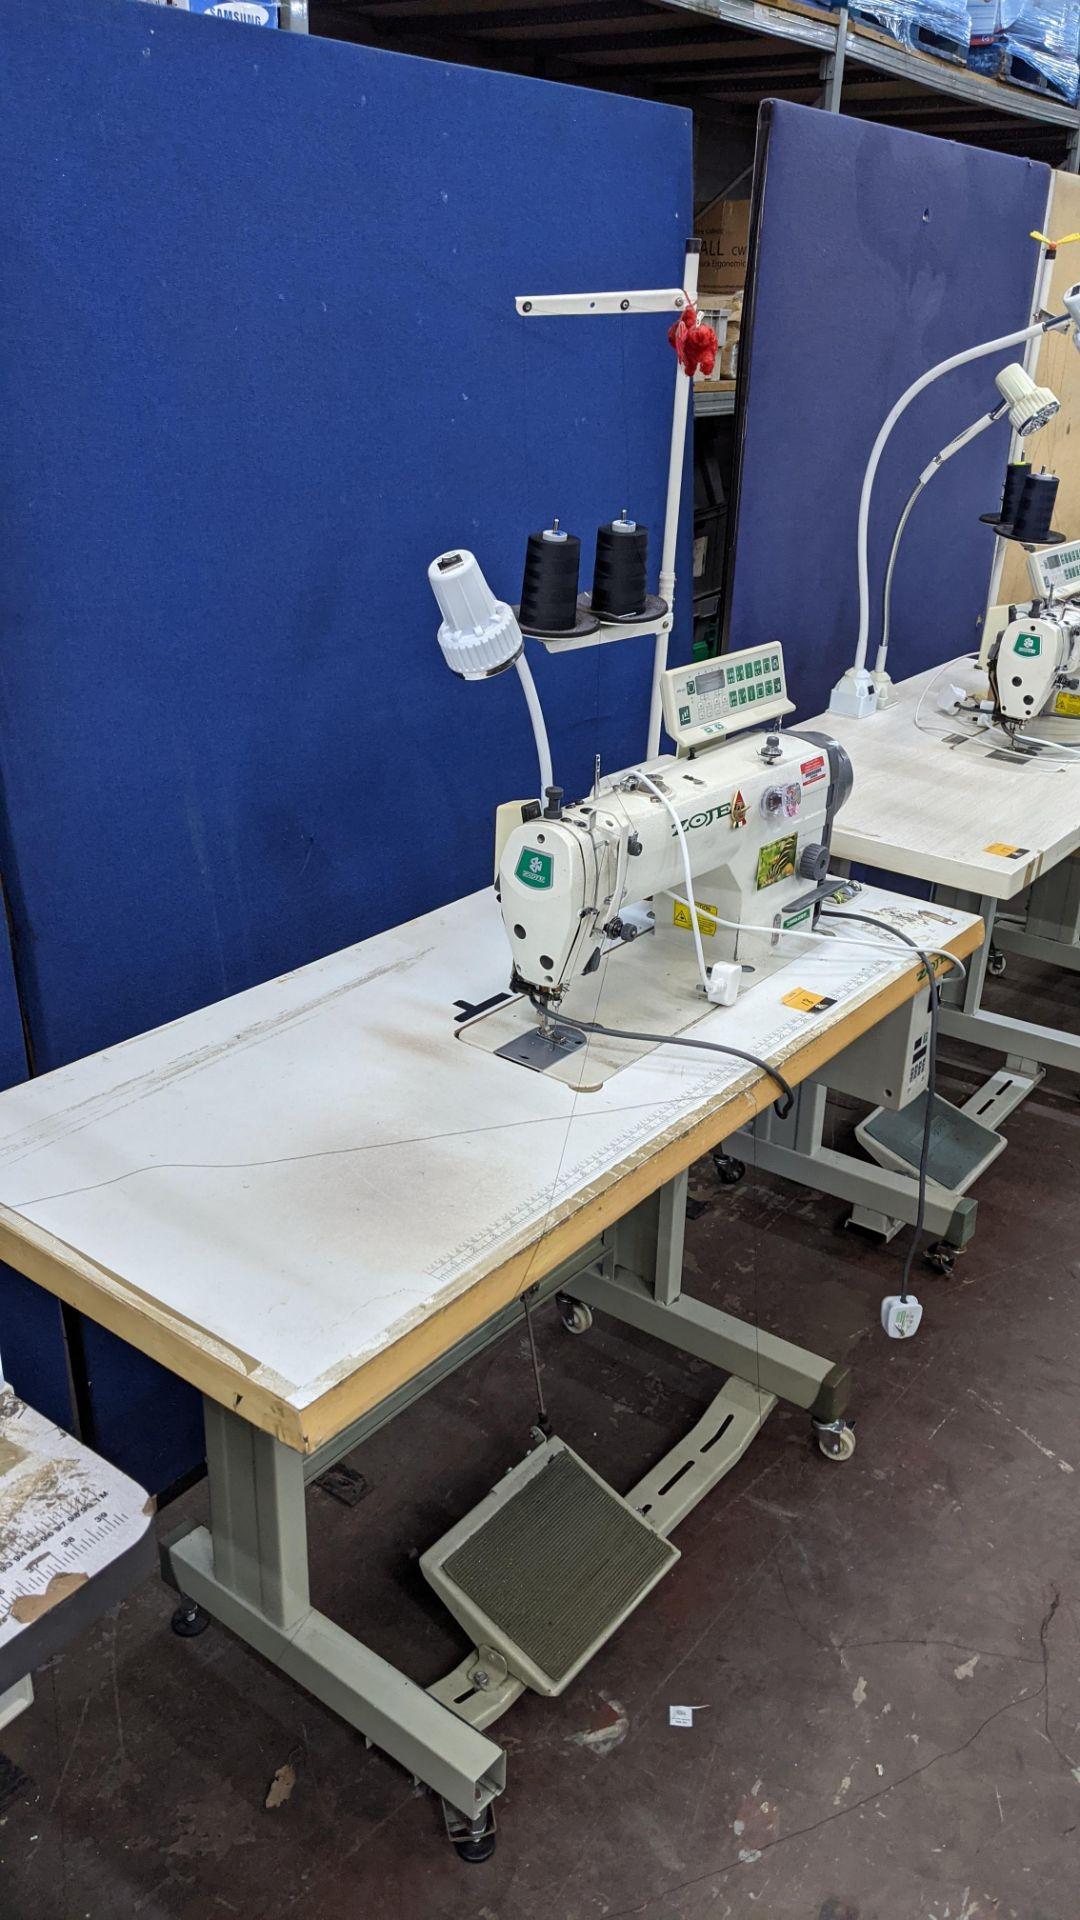 Zoje model ZJ9800A-D3B/PF lockstitch sewing machine with model WR-501 digital controller - Image 20 of 20